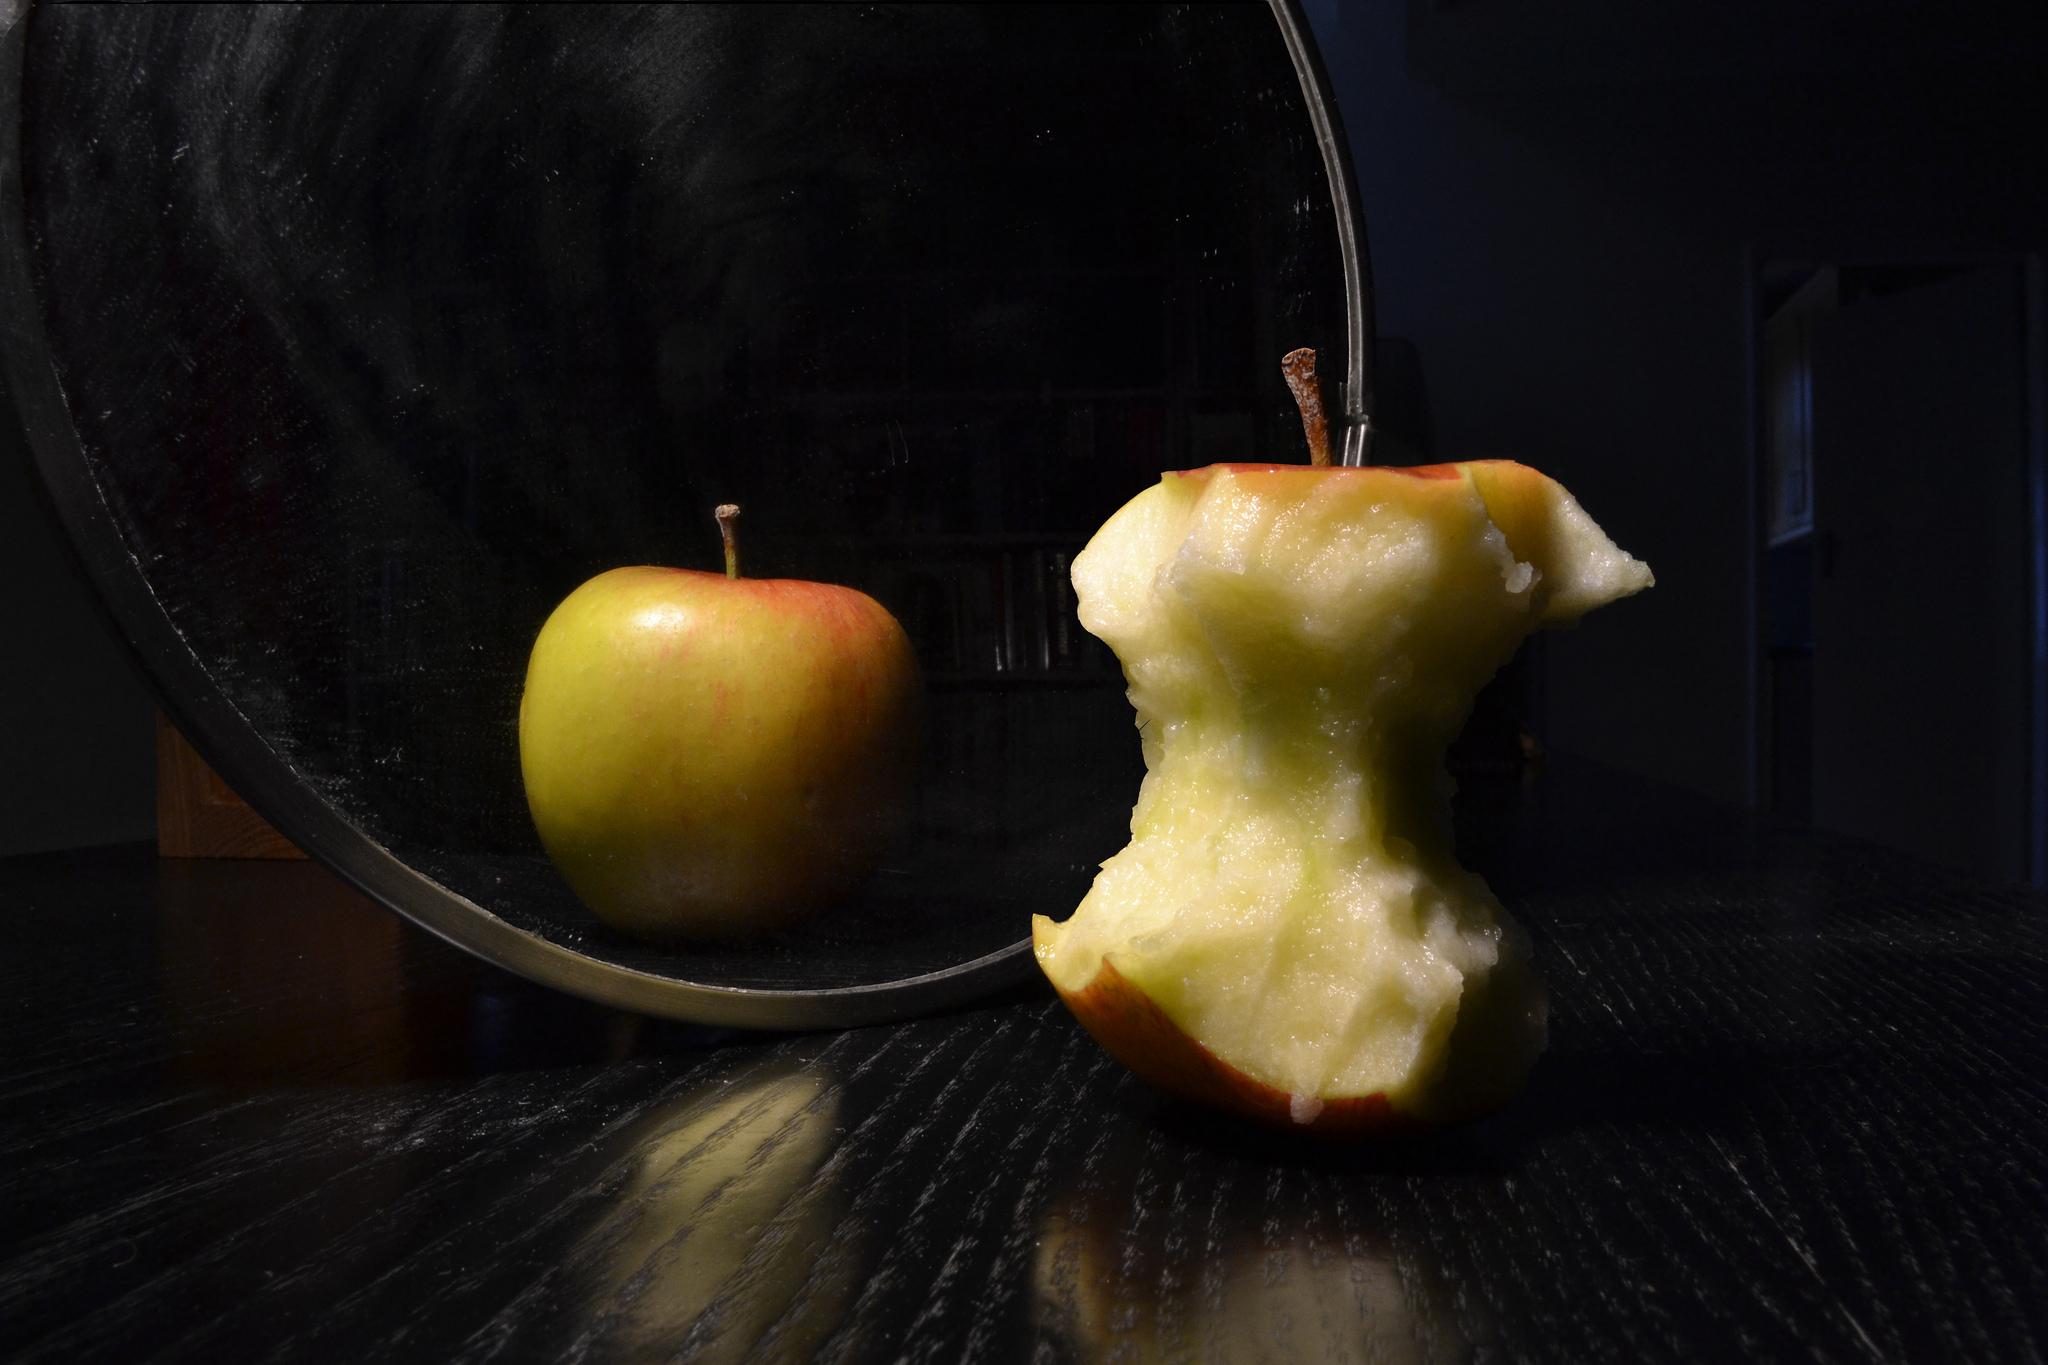 Anorexia nervosa so erkennen mediziner die krankheit for Syndrome miroir